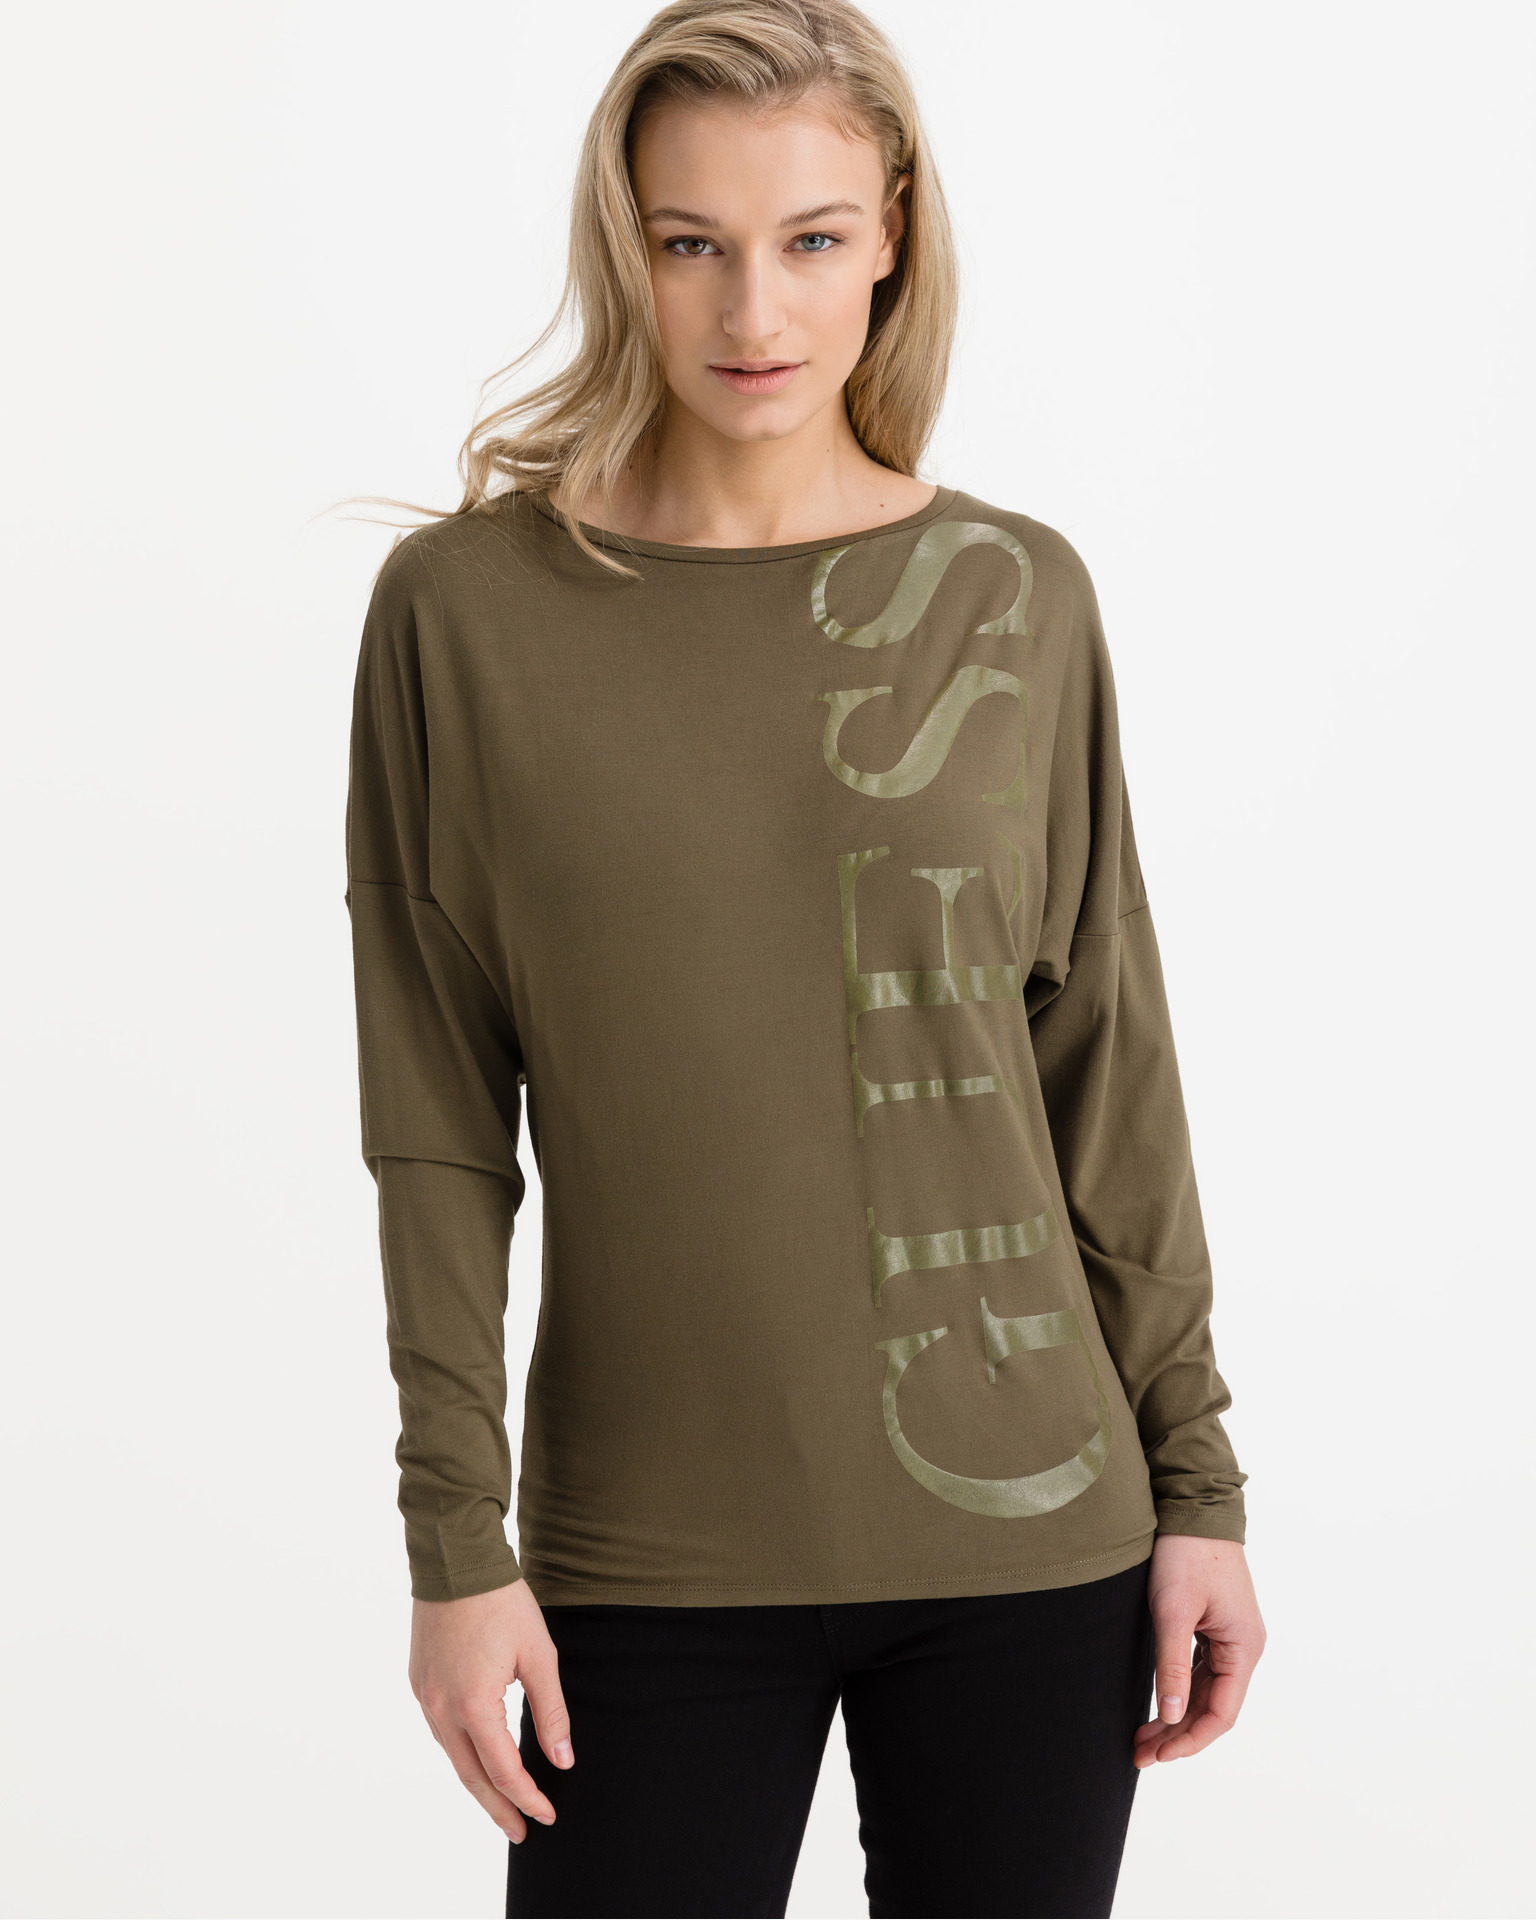 Guess green T-shirt Karolina